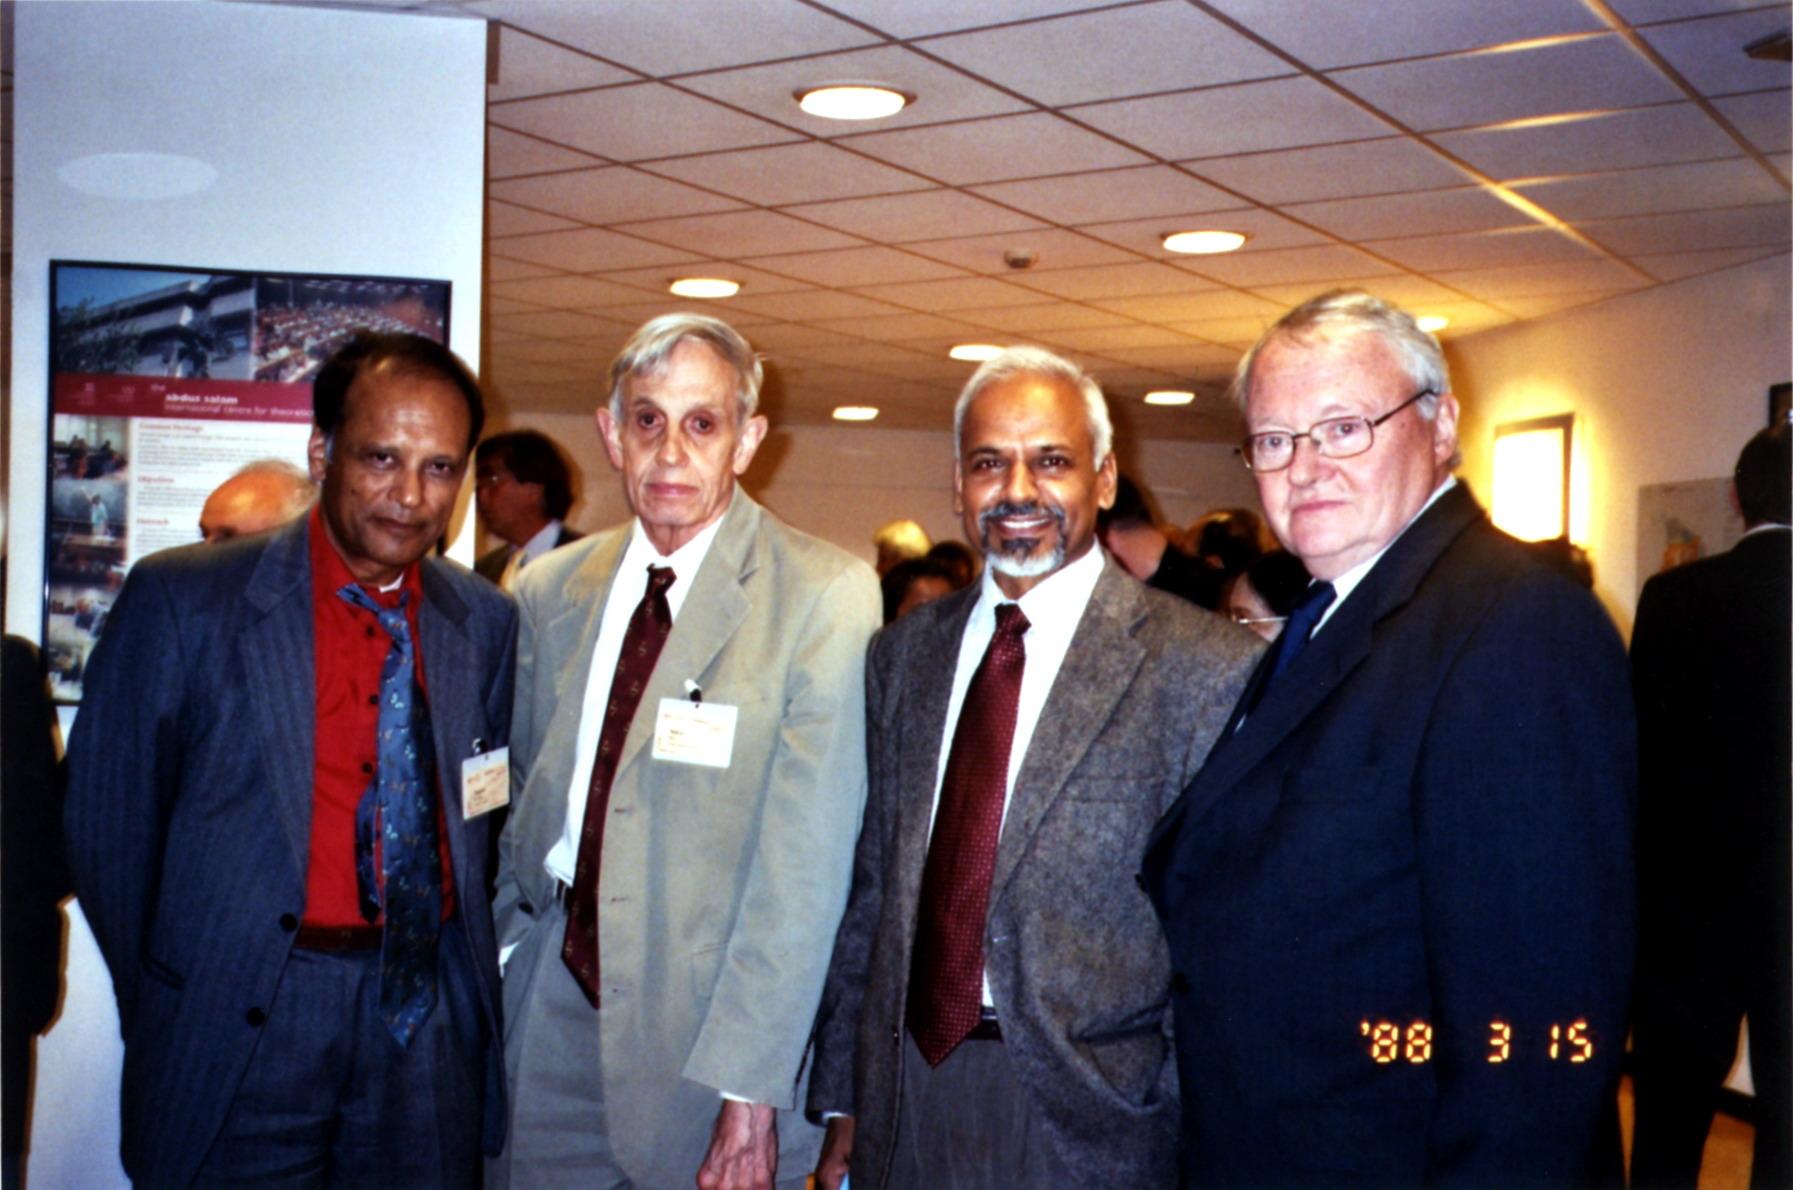 Prabir Dasgupta, John Nash, K.R. Sreenivasan and Karl-Goran Maler